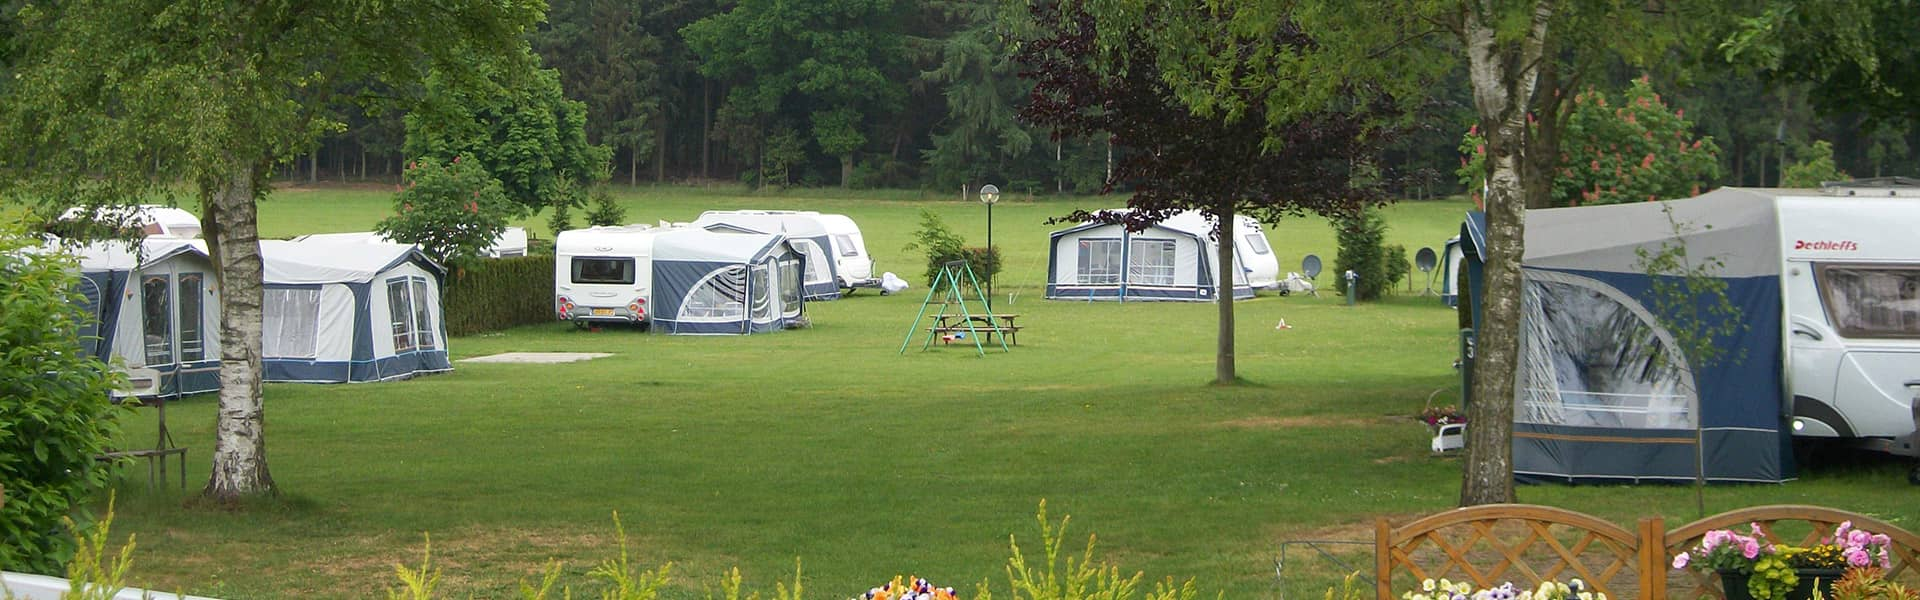 Home header 6 - camping de prinsenhoeve